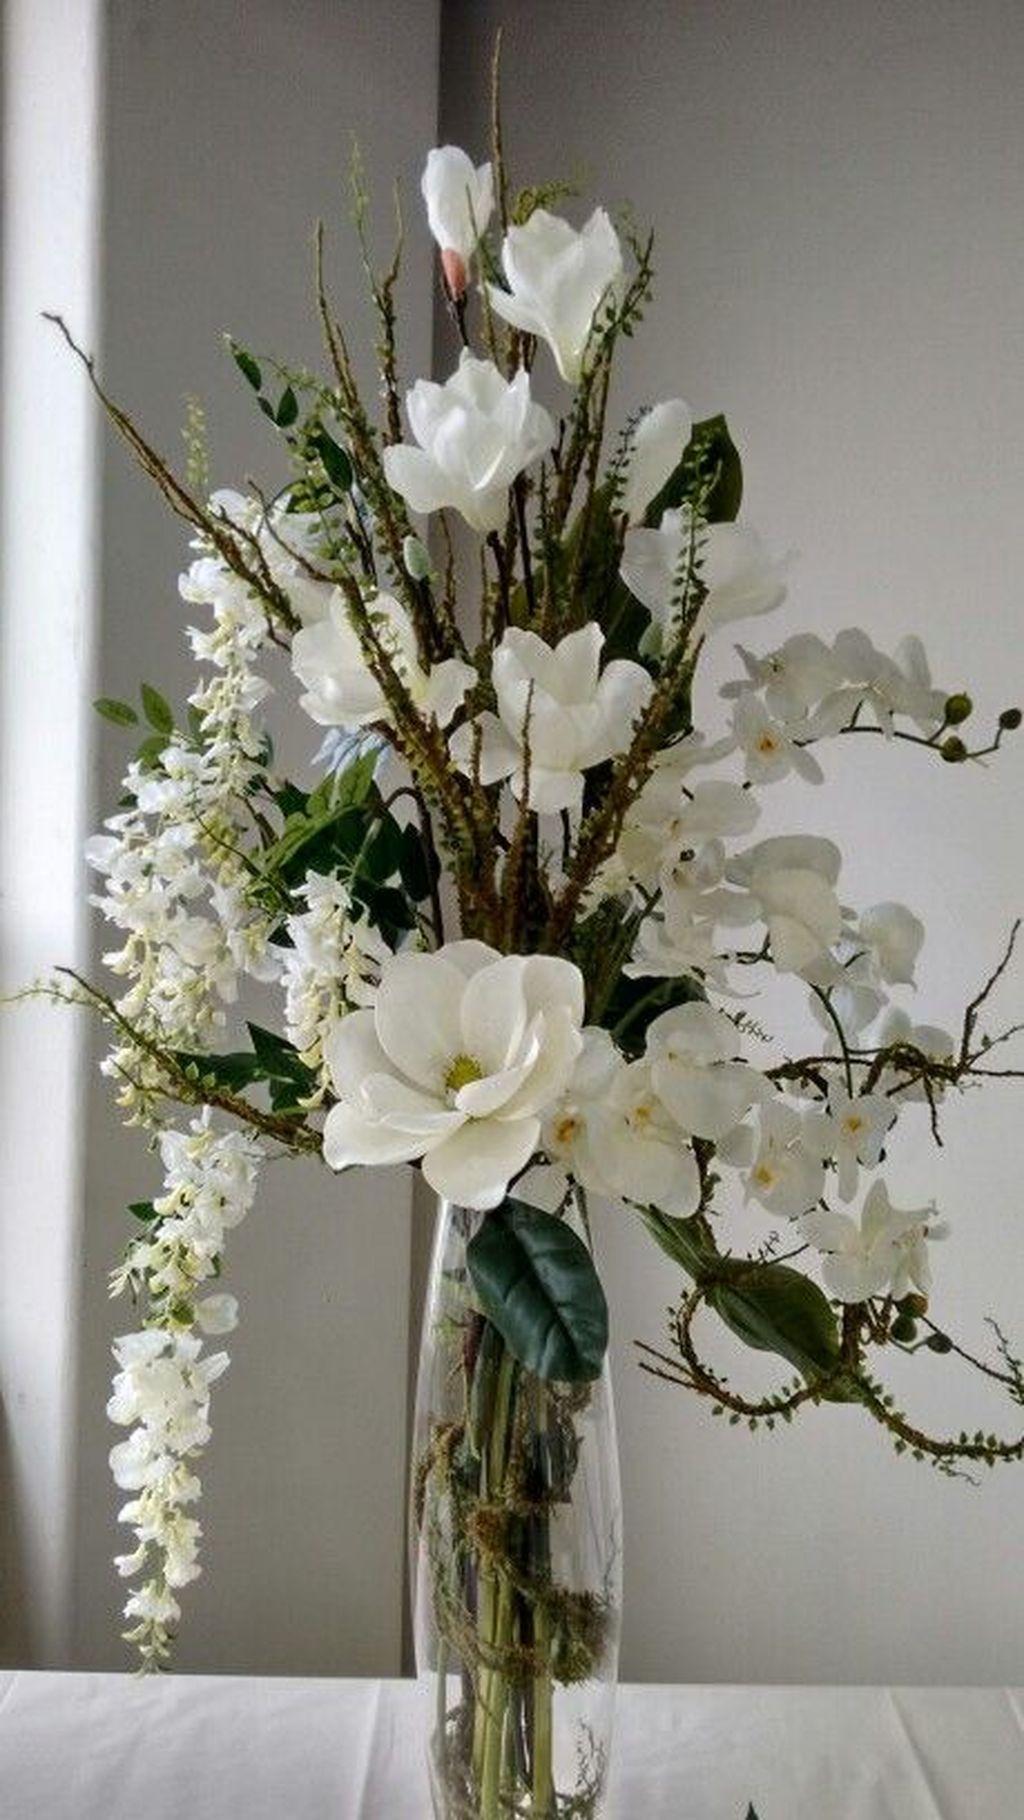 20 Elegant Room Decoration Ideas With Flower Vases Flower Arrangements Simple Orchid Flower Arrangements White Flower Arrangements